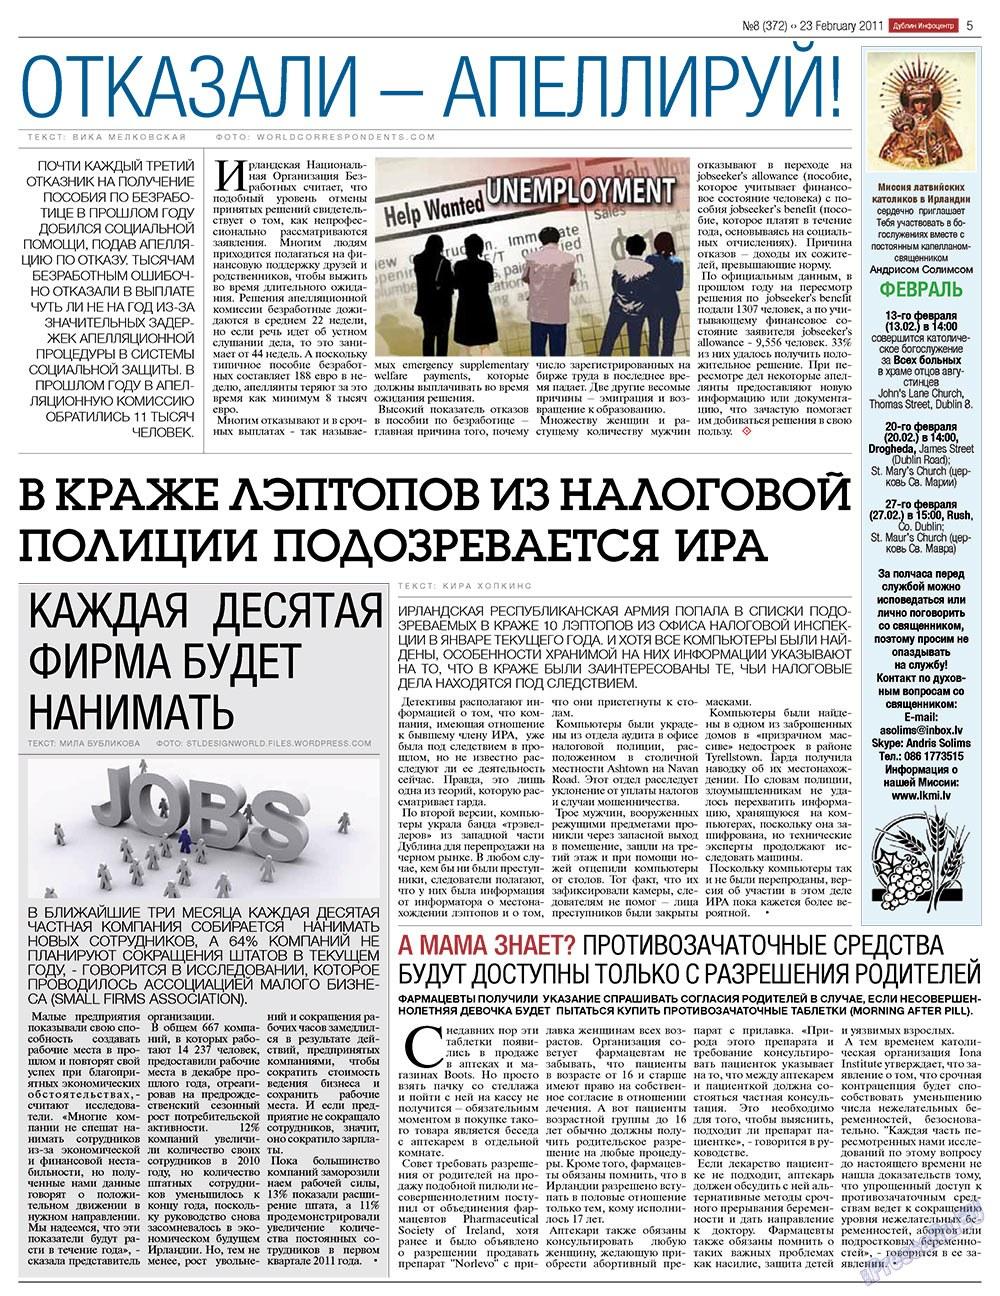 Дублин инфоцентр (газета). 2011 год, номер 8, стр. 5